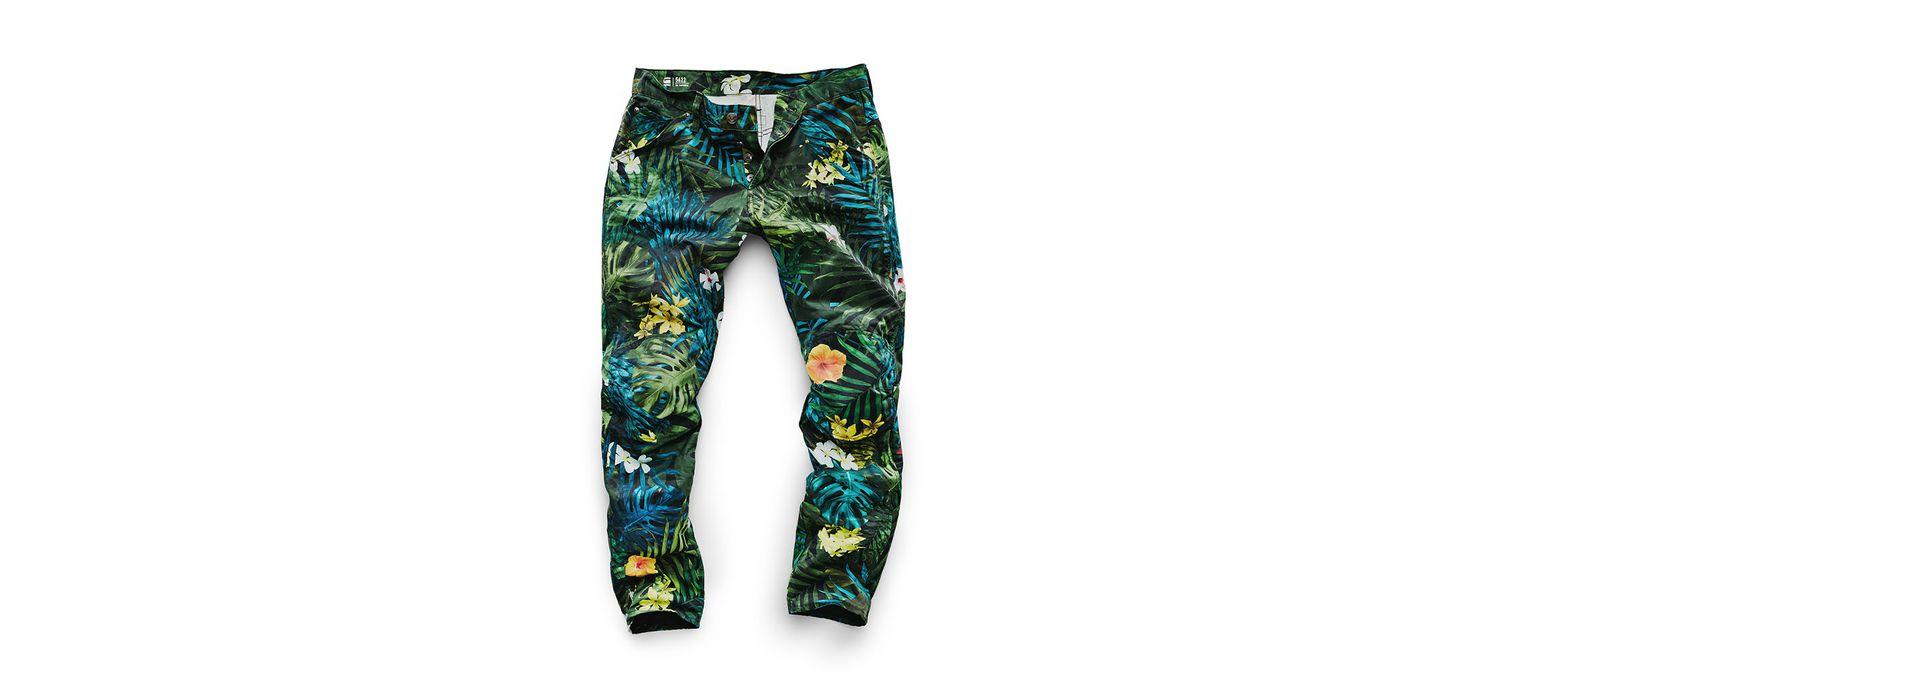 19b2849b405 G-Star RAW® G-Star Elwood X25 3D Tapered Men's Jeans Green ...